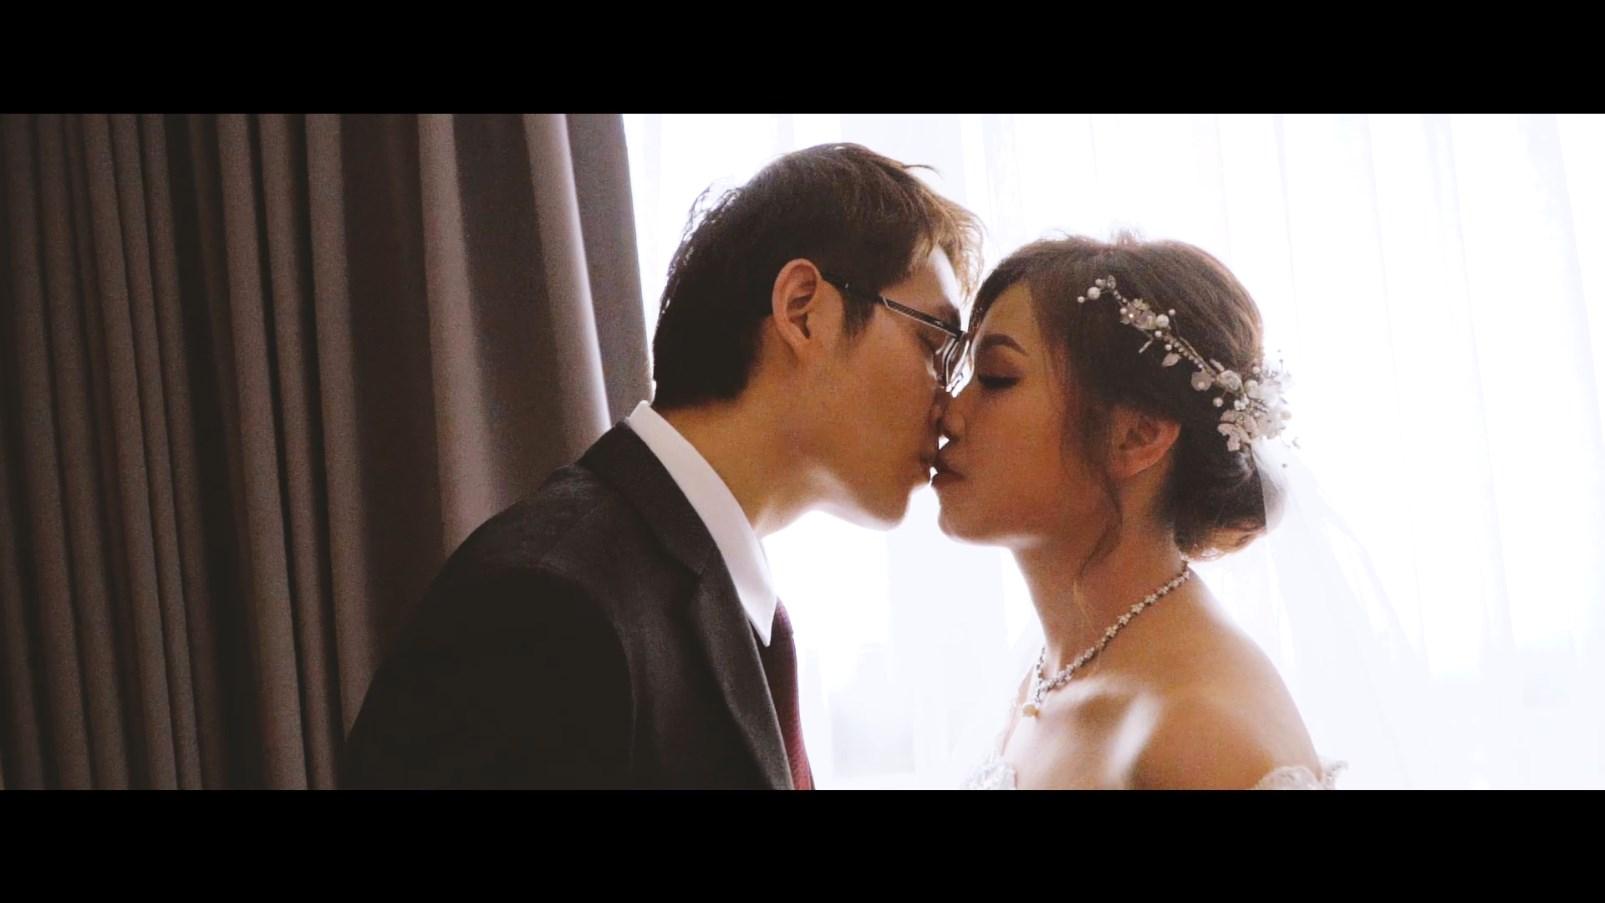 Andy & Sabrina Wedding Mv SDE 大直典華.mp4_snapshot_05.54_[2018.12.28_13.51.37]